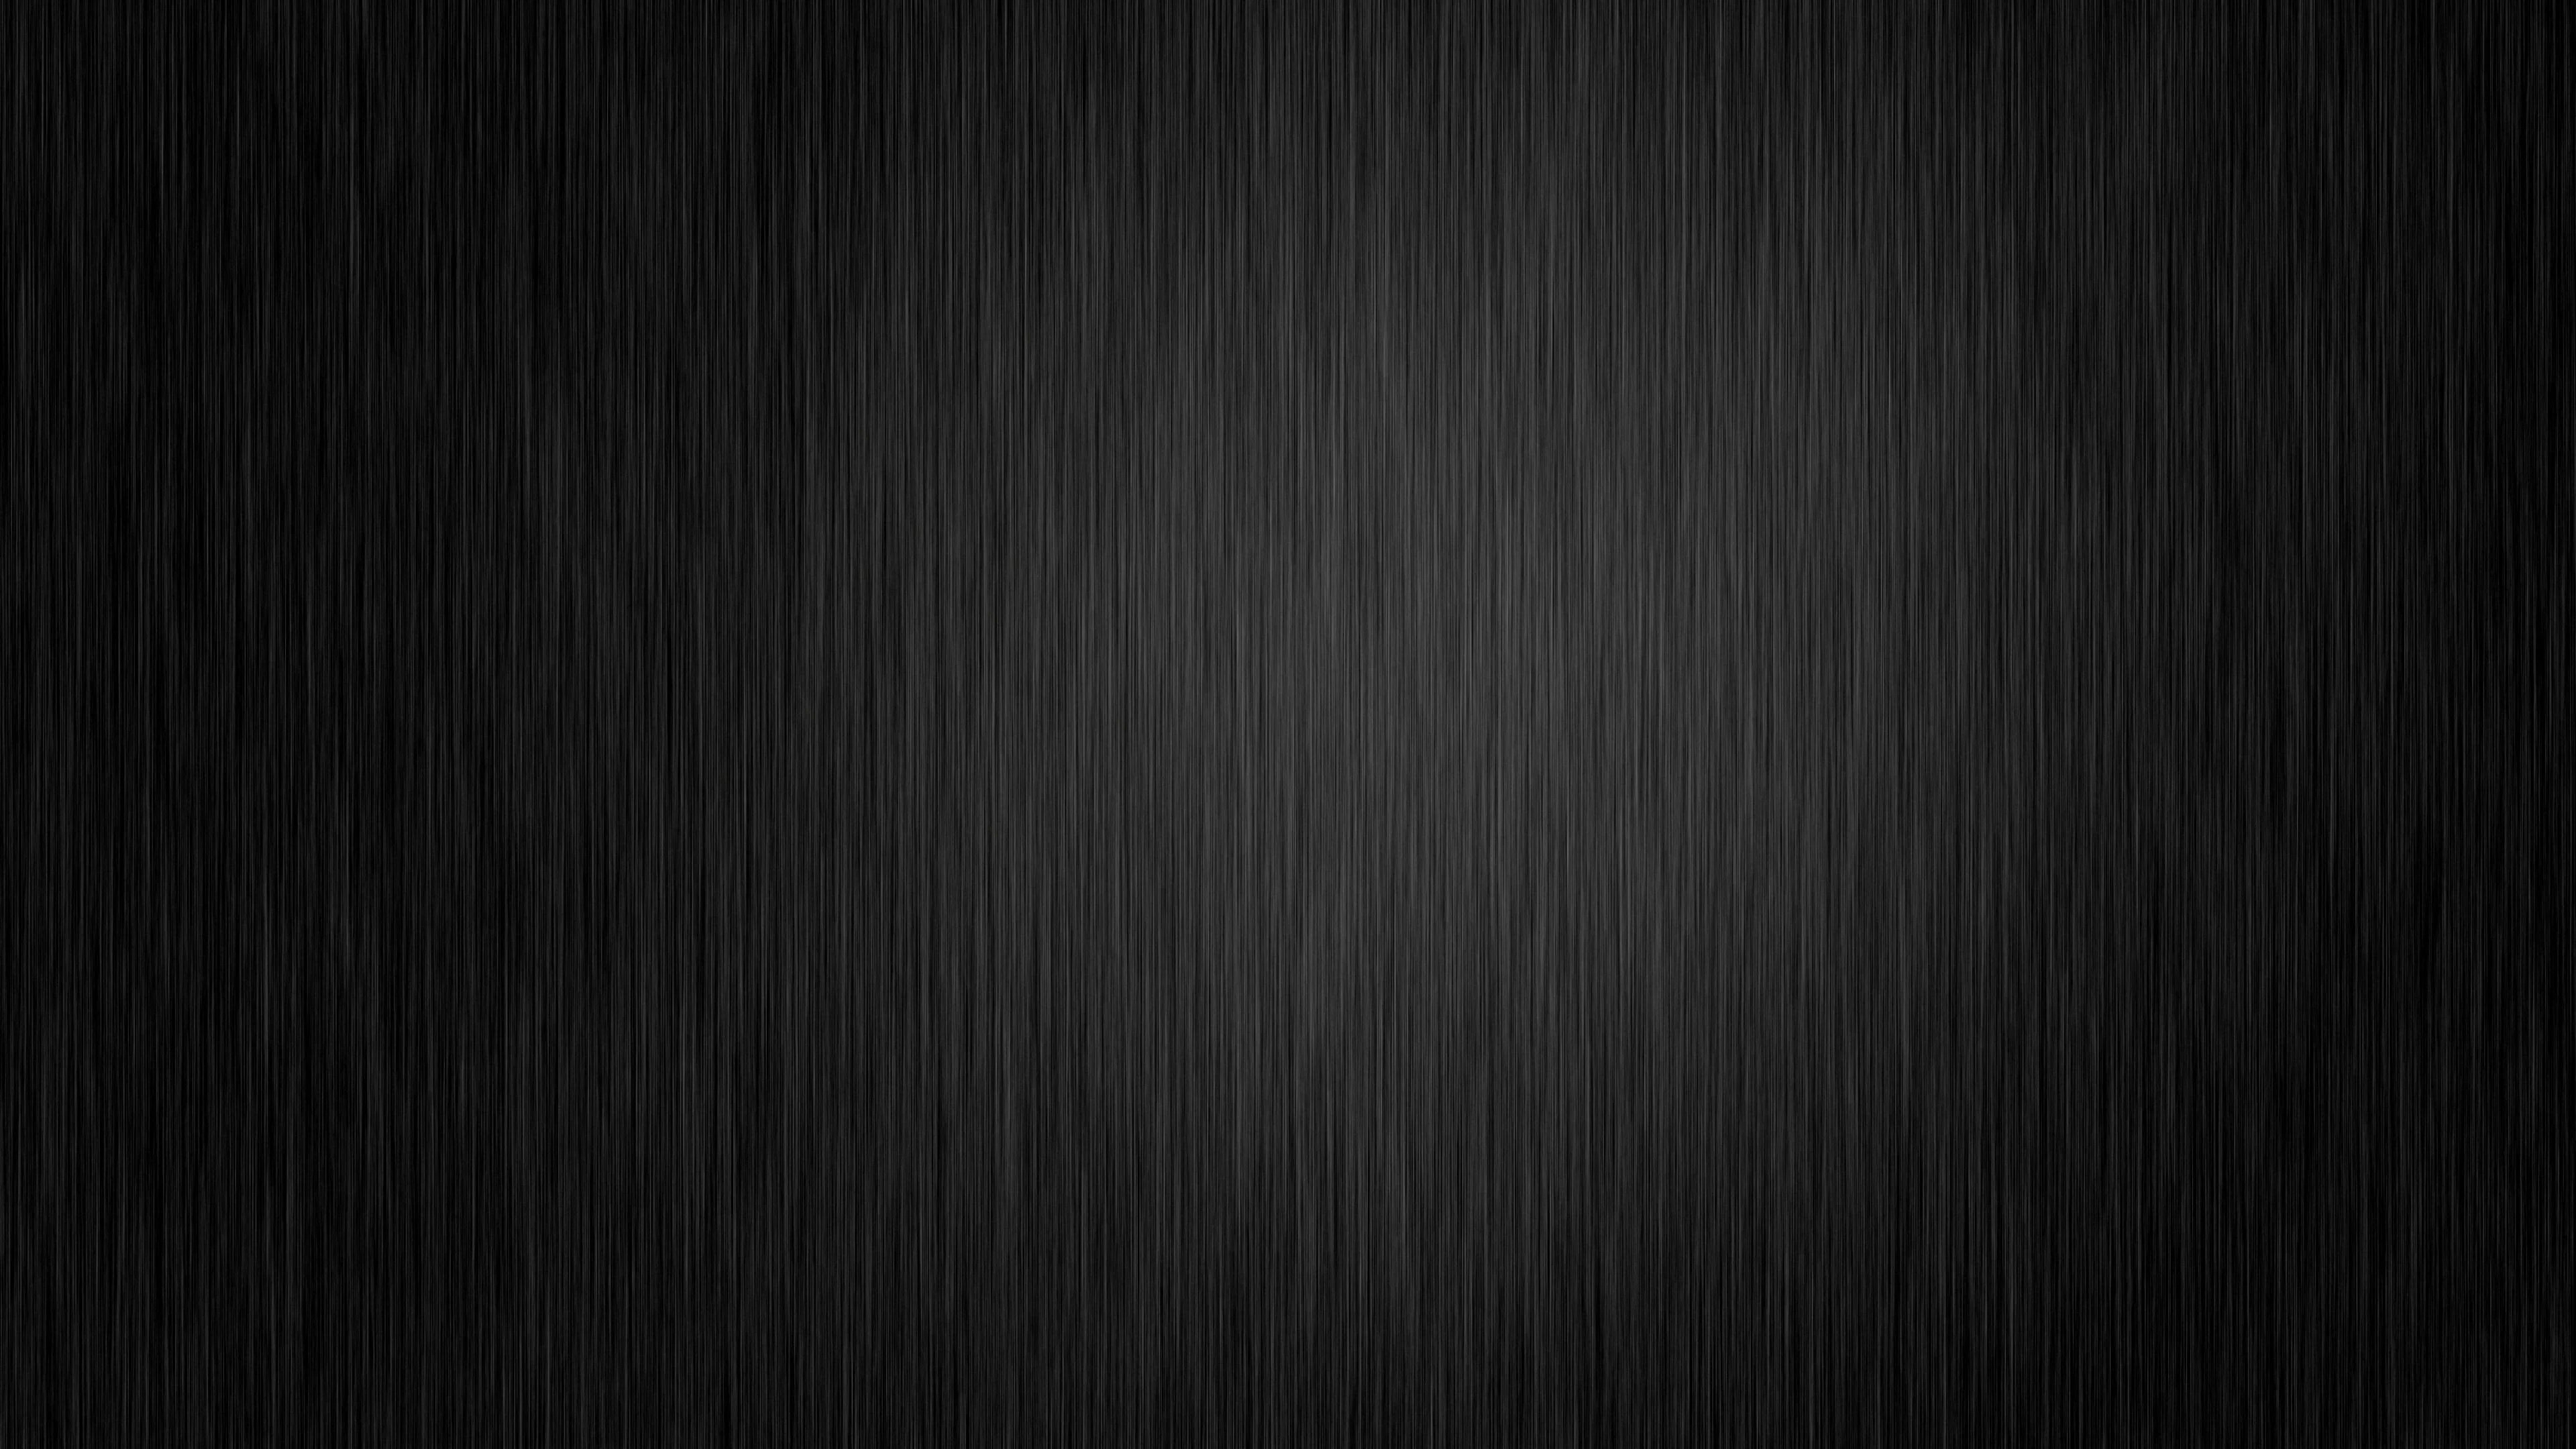 4k ultra hd black